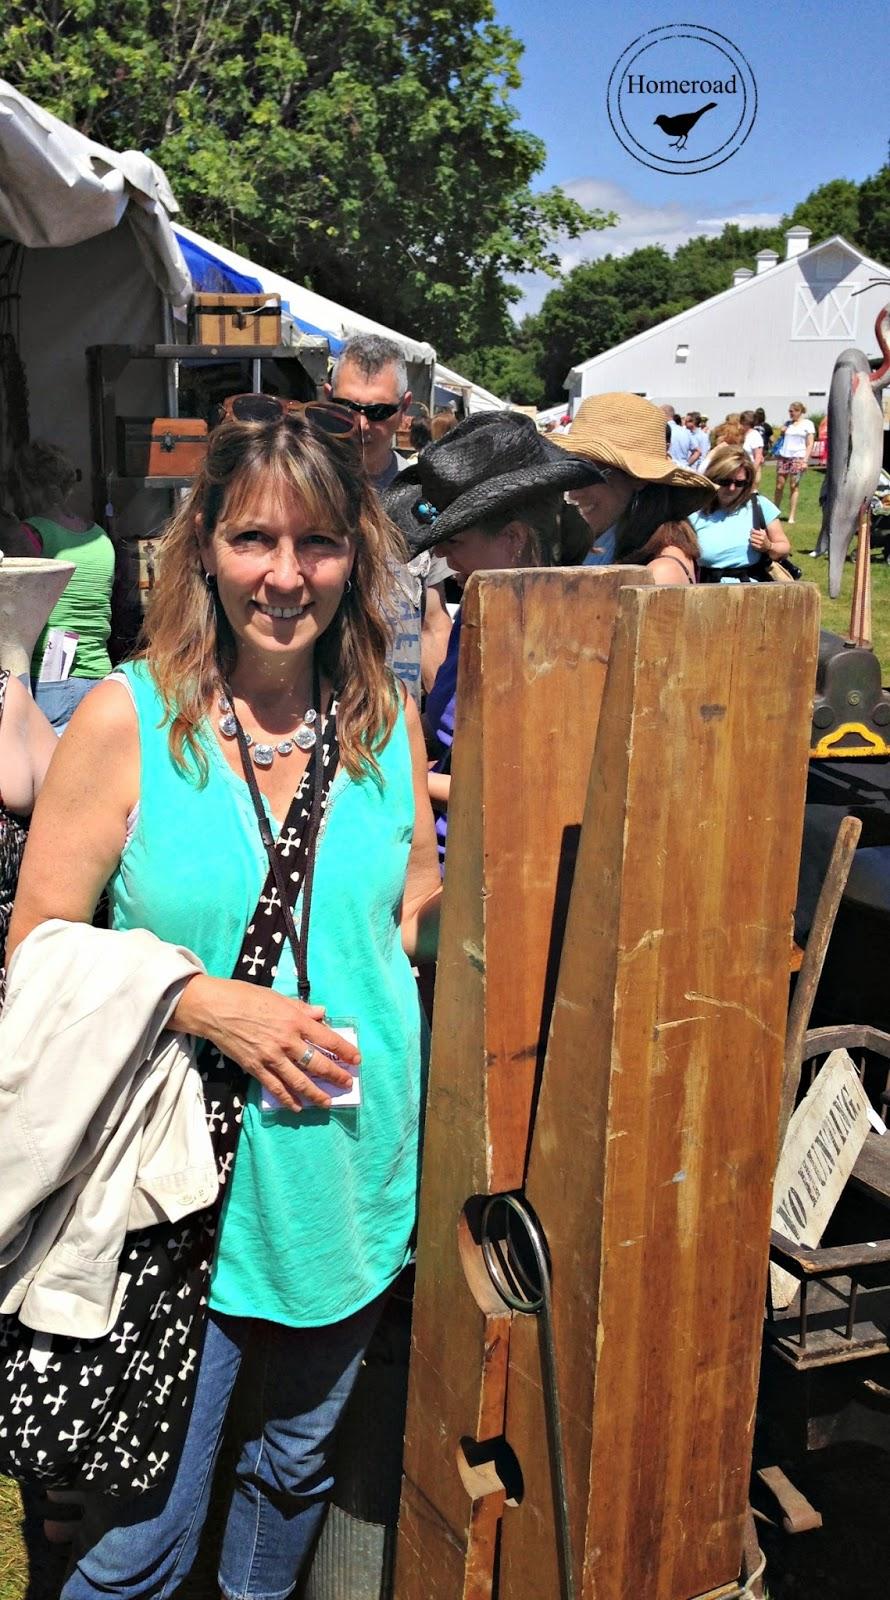 Country-living-fair-Rhinebeck-NY www.homeroad.net